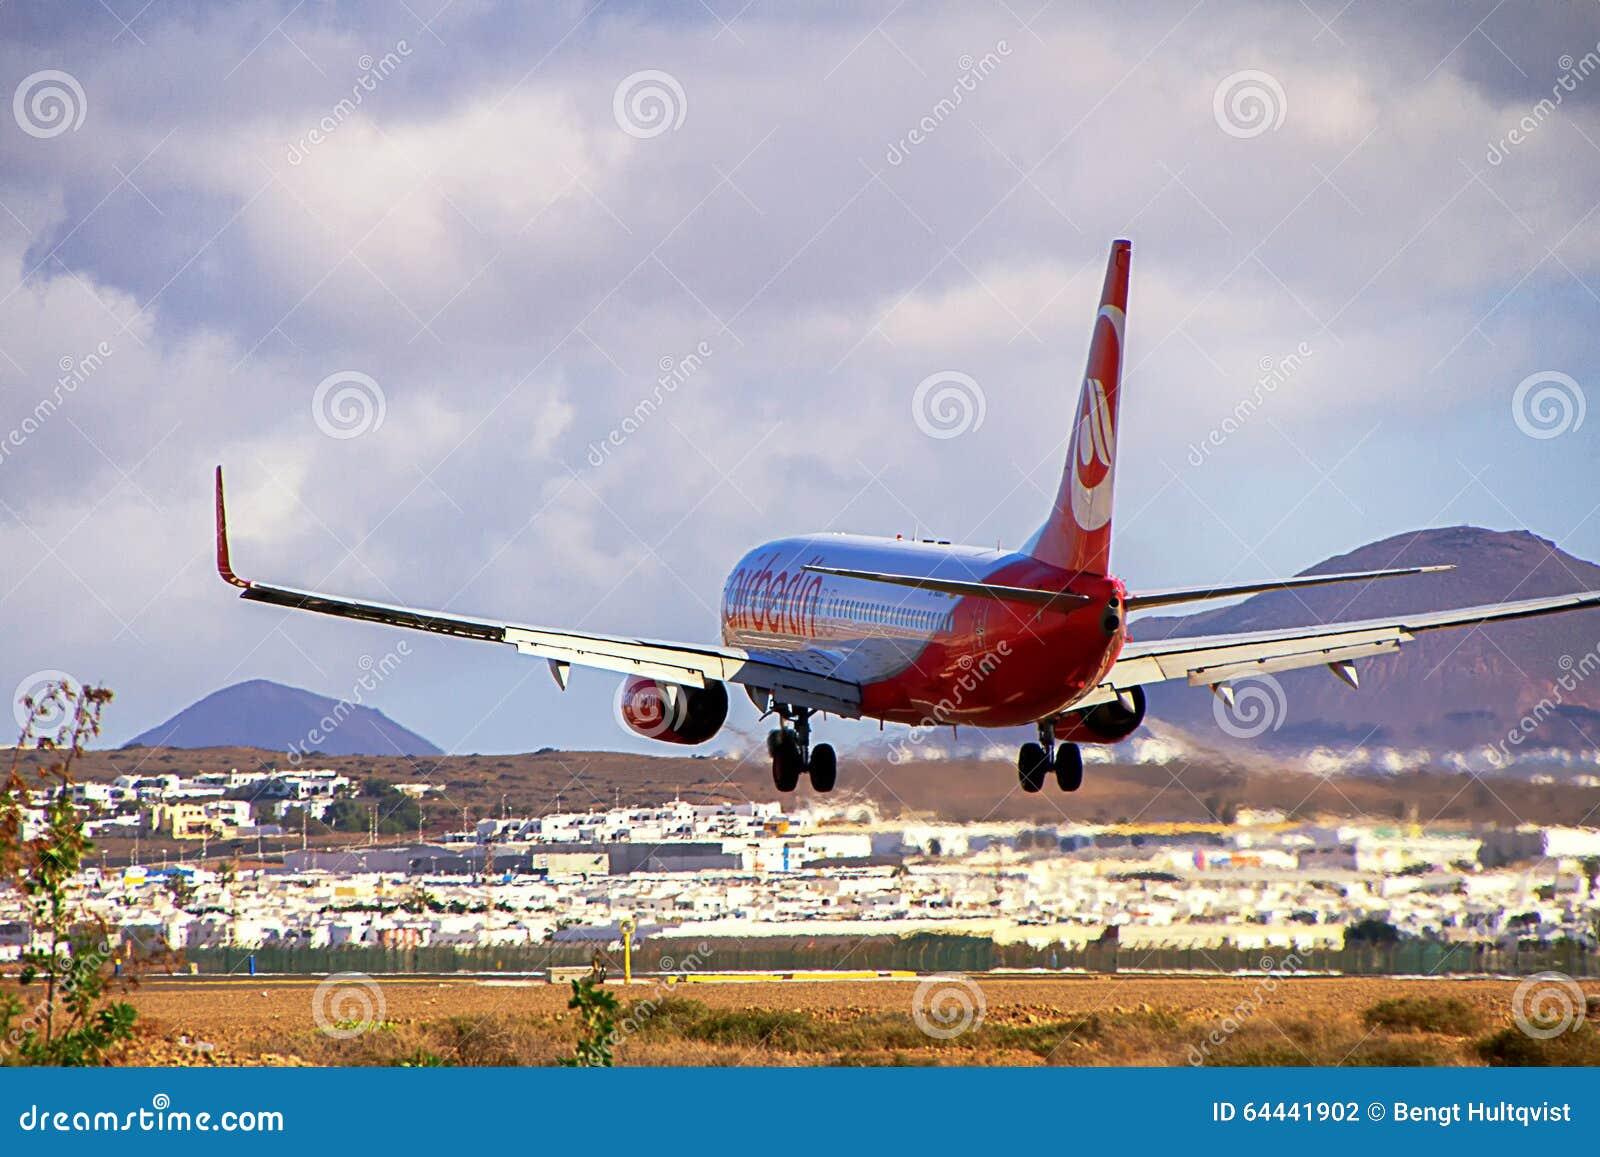 Airberlin飞机在兰萨罗特岛海岛上的波音737-800着陆